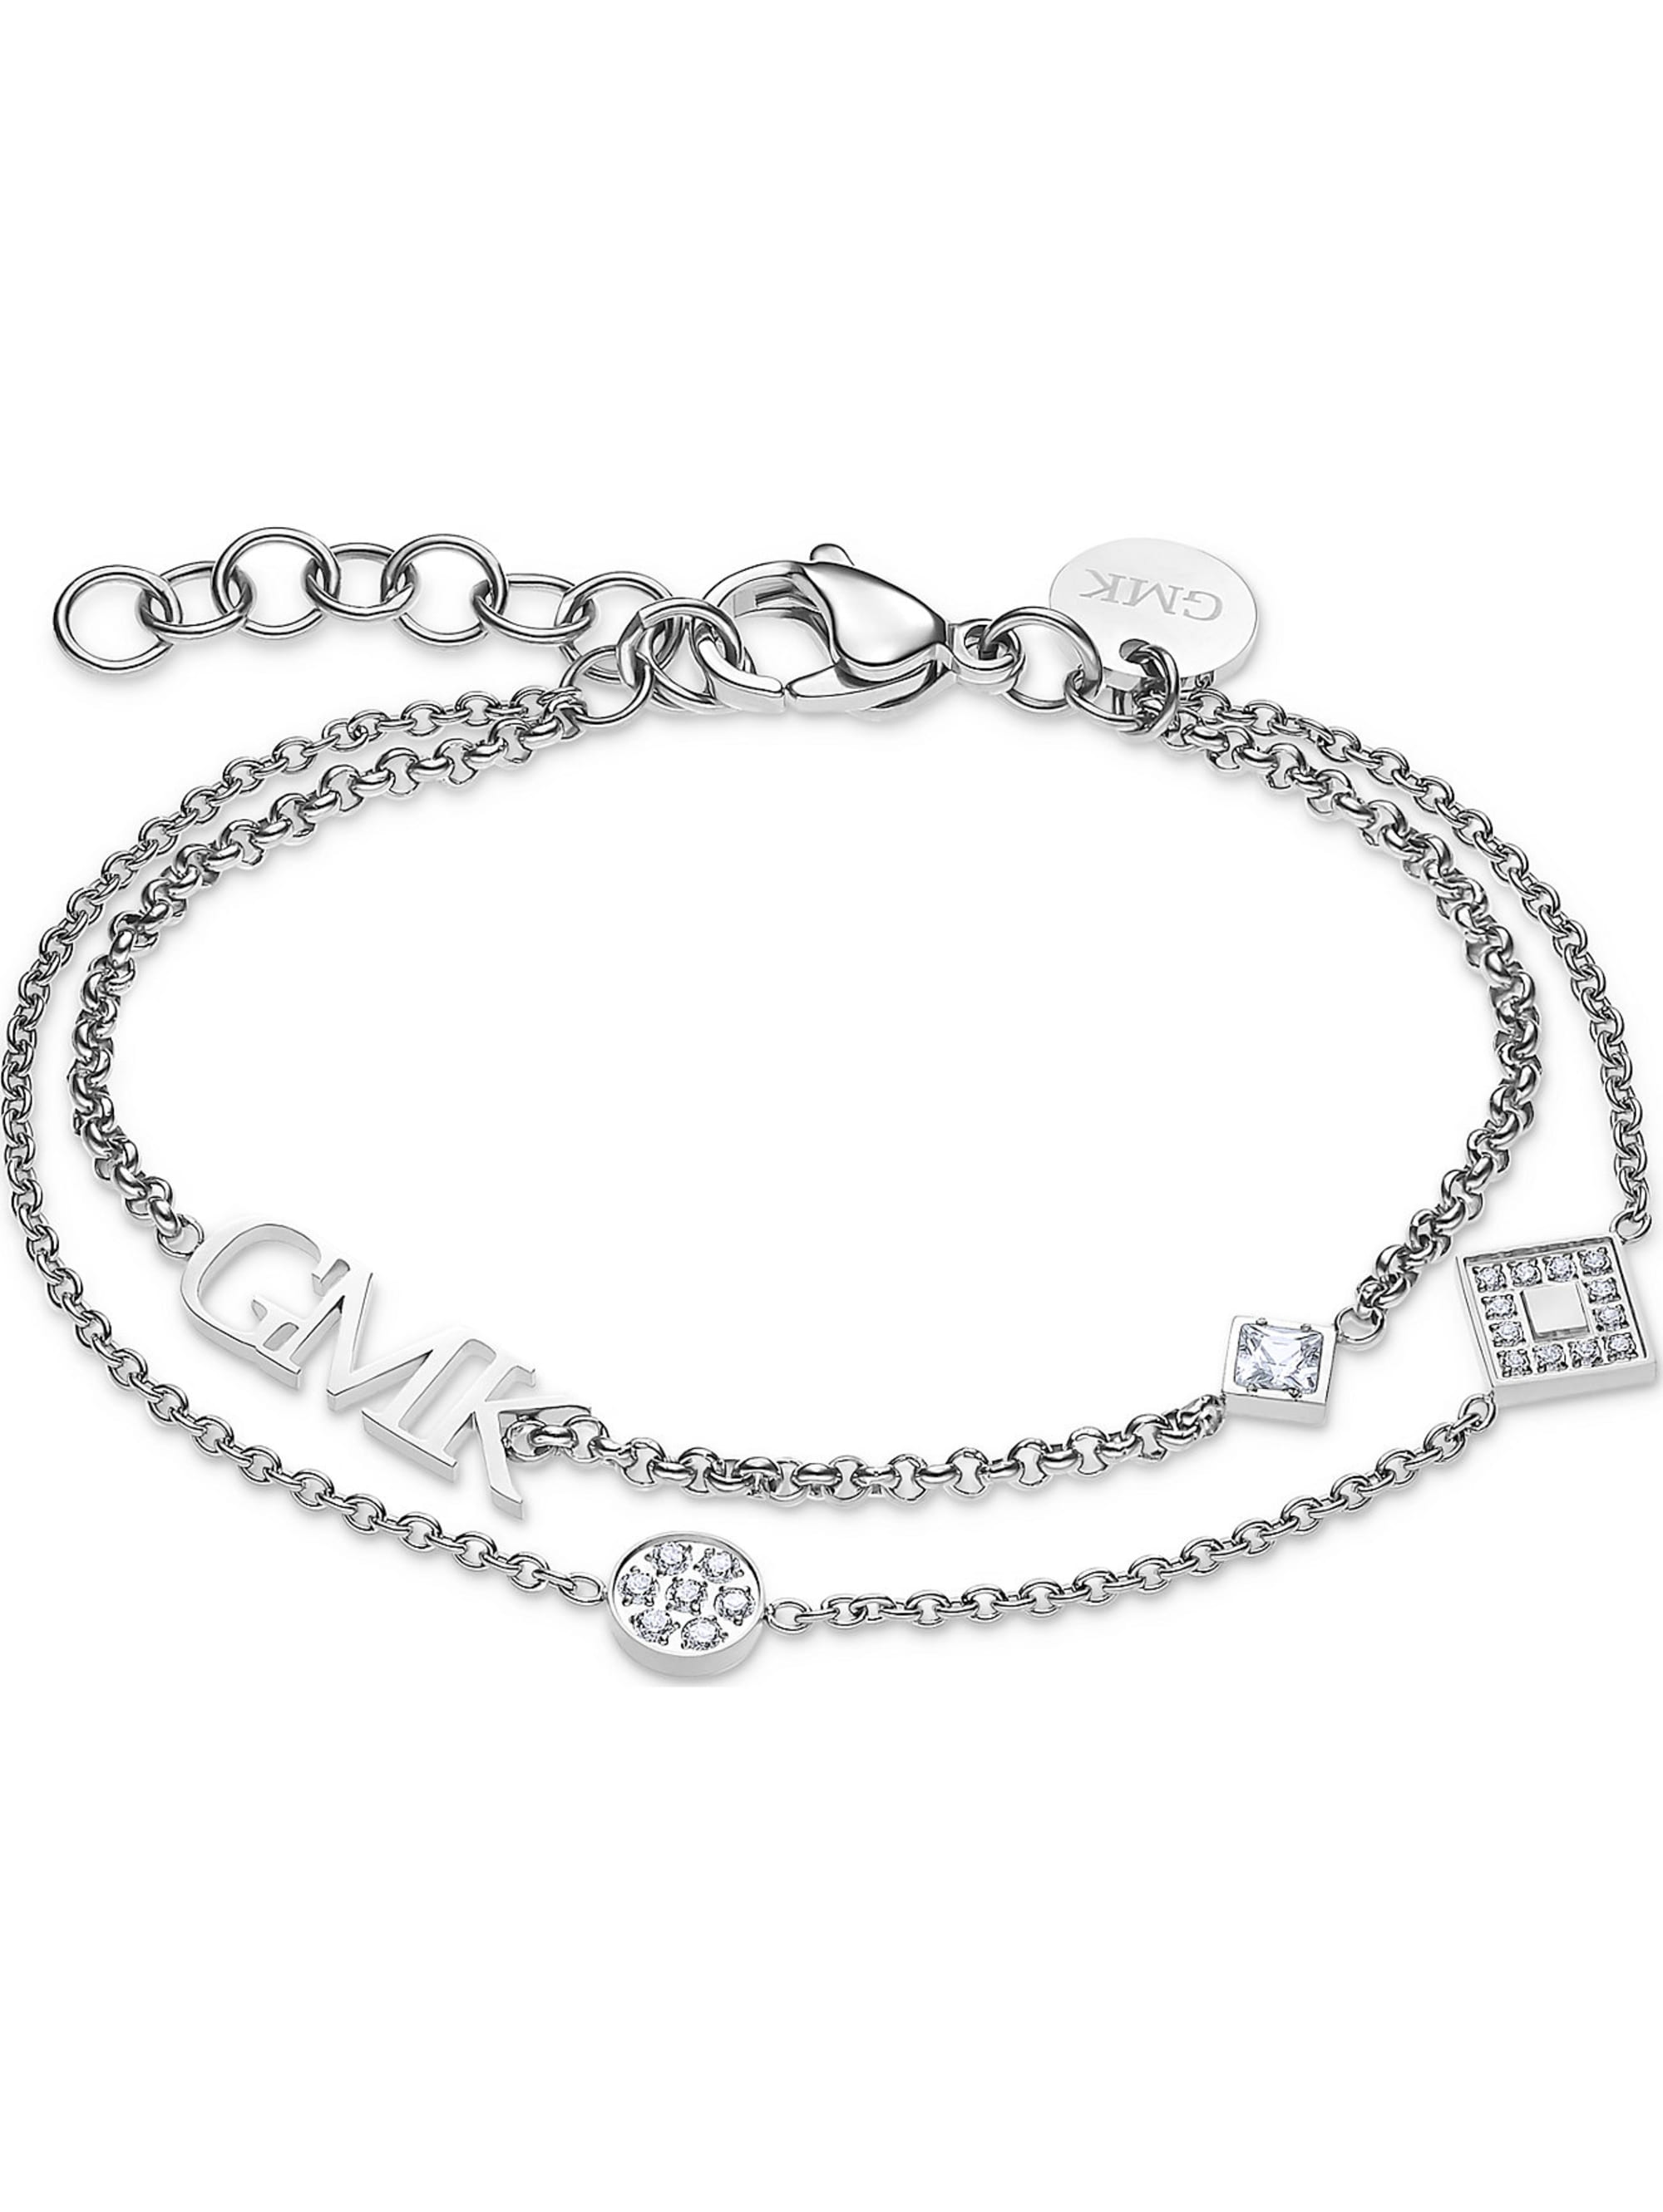 Guido Maria Kretschmer Collec. GMK Collection Damen-Armband Edelstahl 20 Zirkonia VQvgN